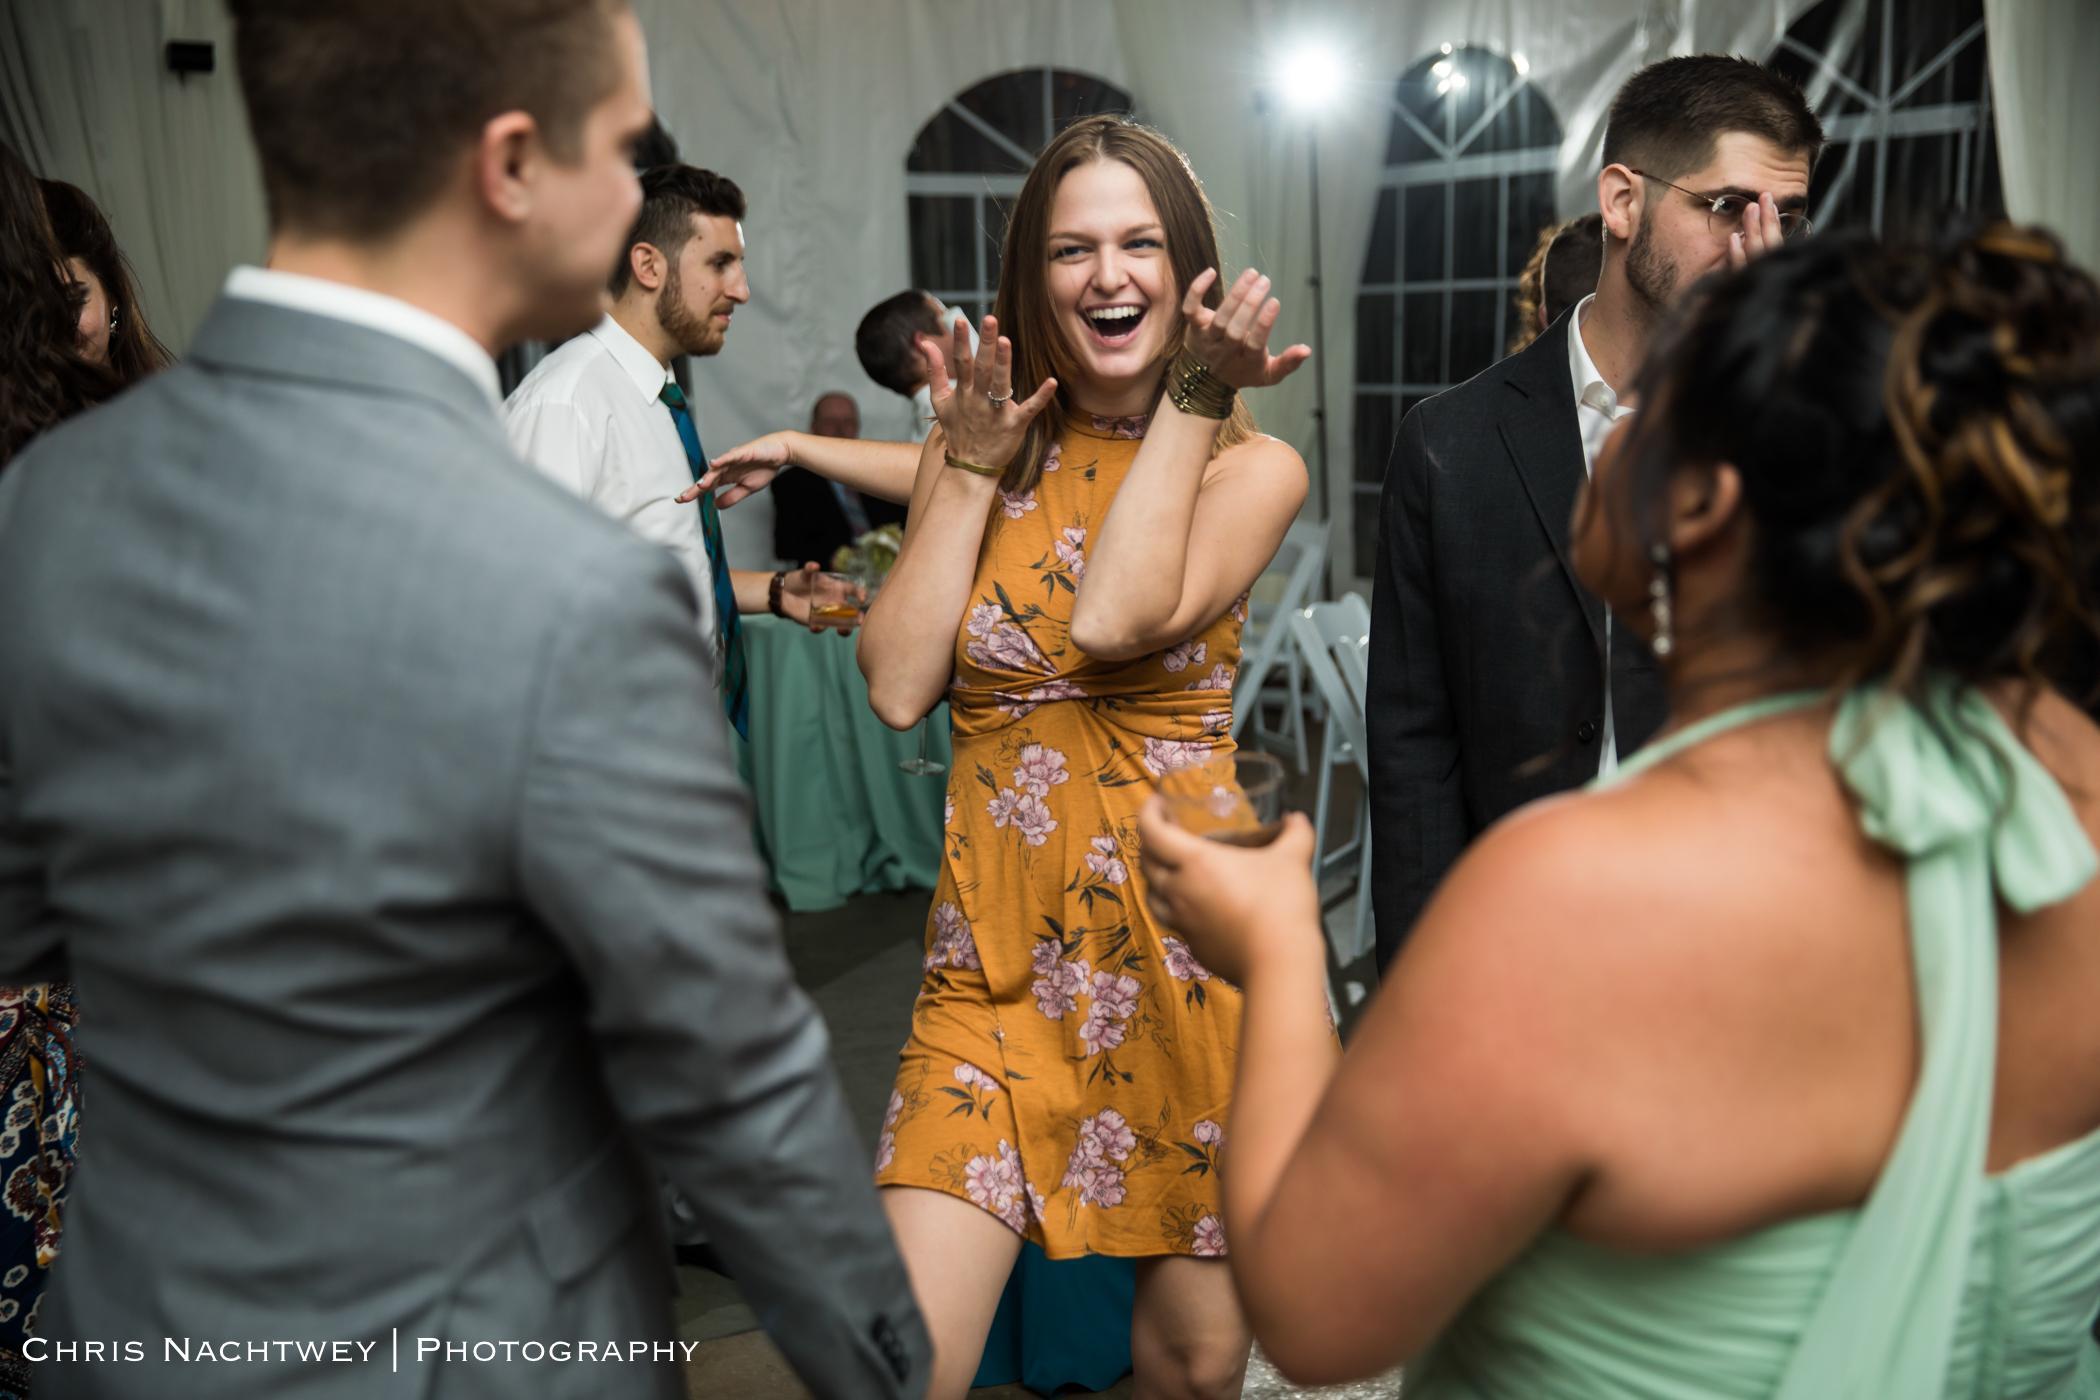 harkness-wedding-photos-chris-nachtwey-photography-2018-45.jpg